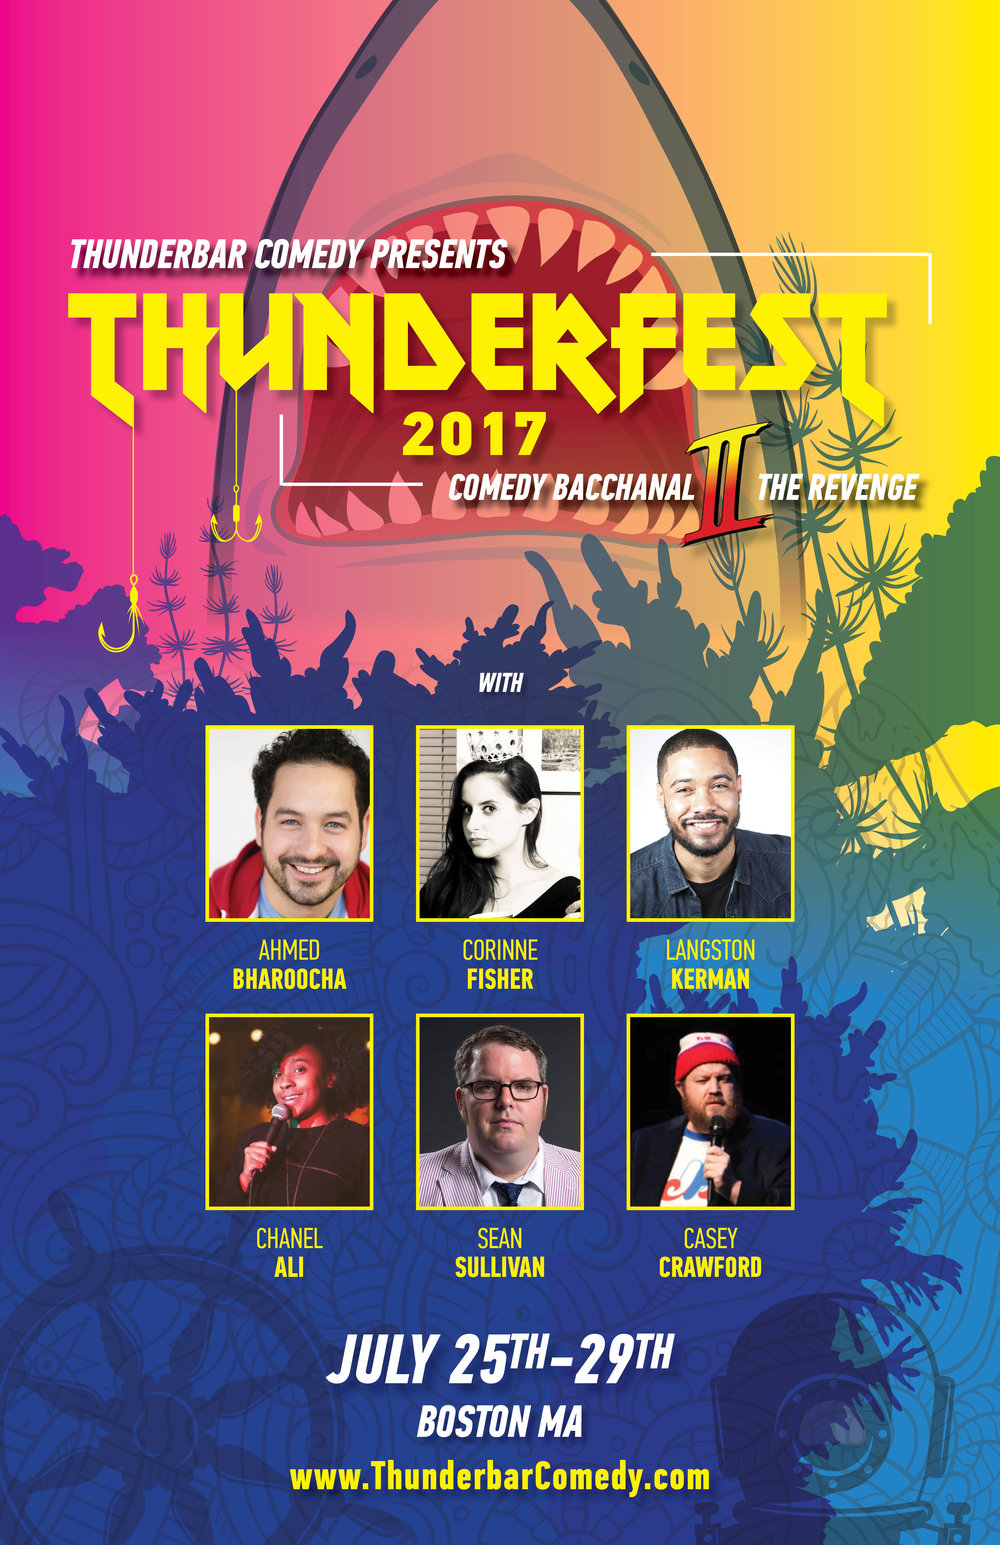 062217_Thunderfest2017_jaws (1).jpg